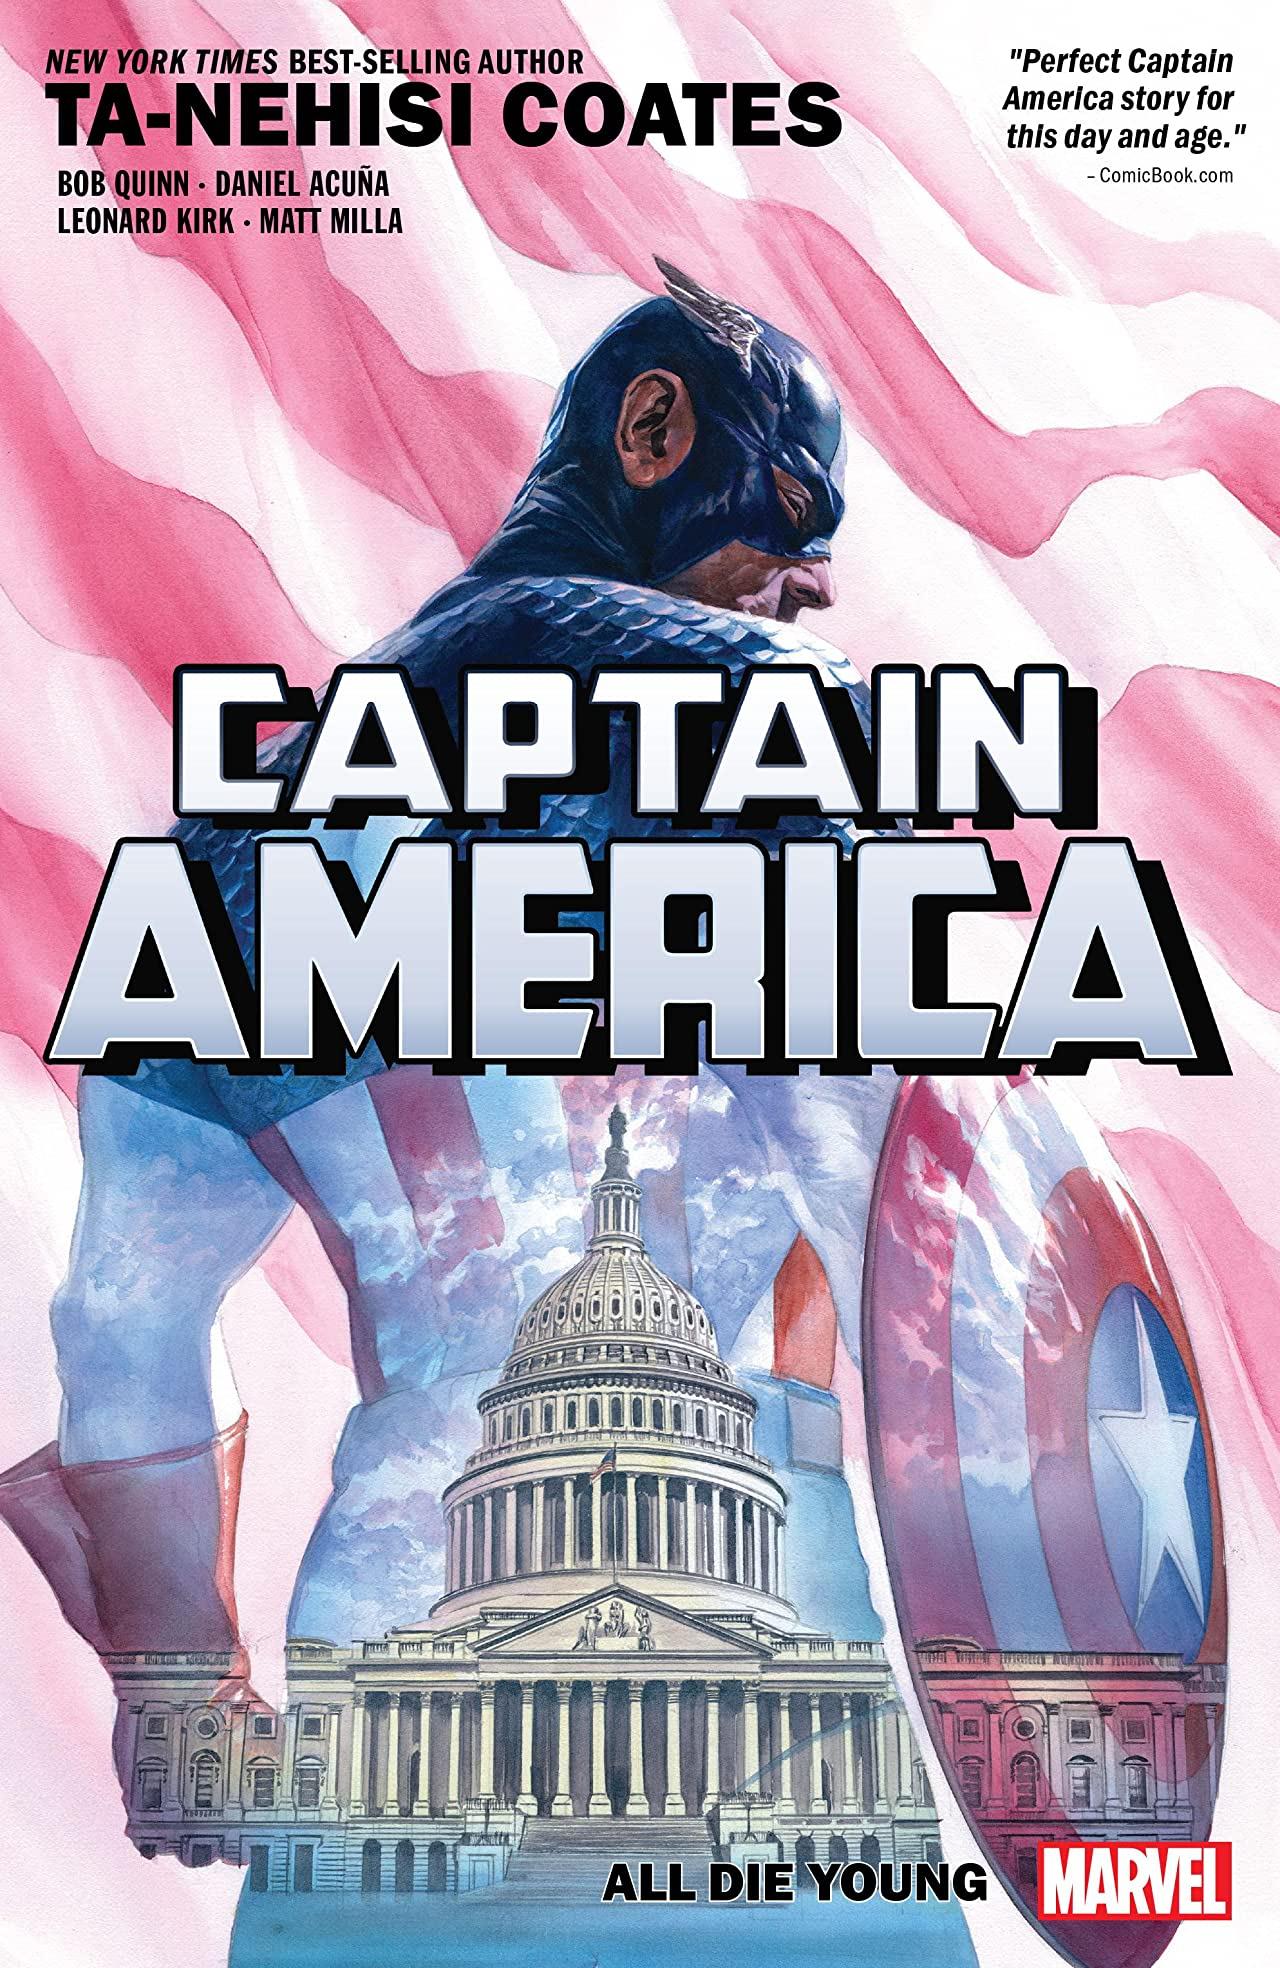 Captain America by Ta-Nehisi Coates Vol. 4 by Ta-Nehisi Coates